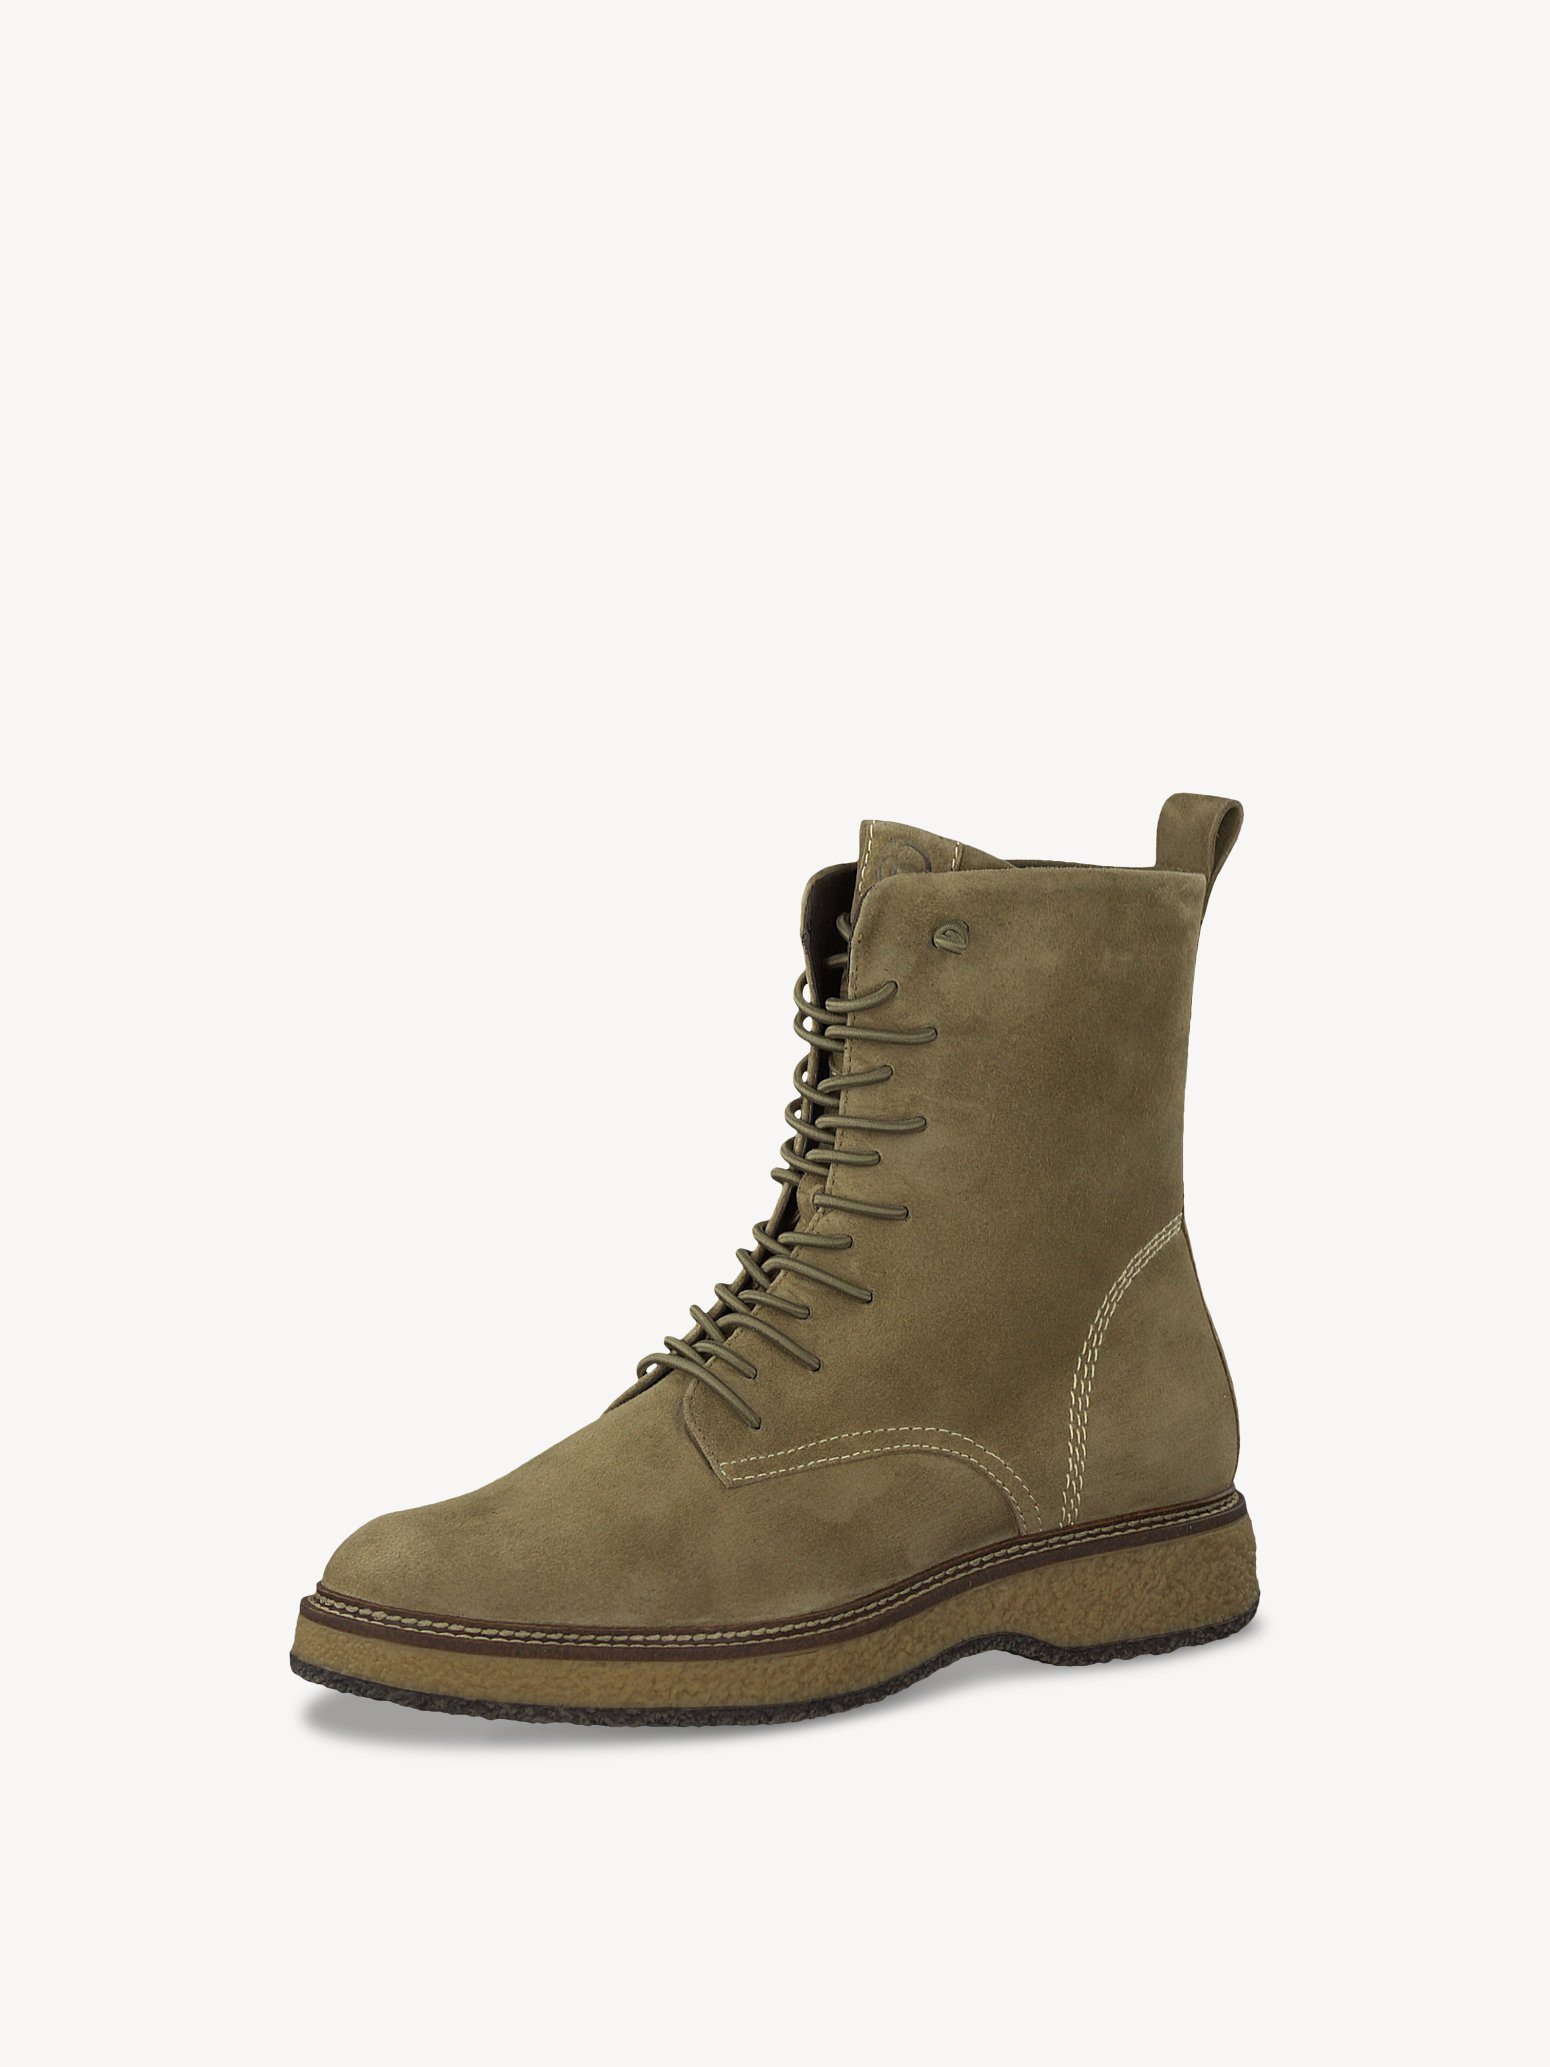 Ботинки Tamaris 1-1-25215-25-341